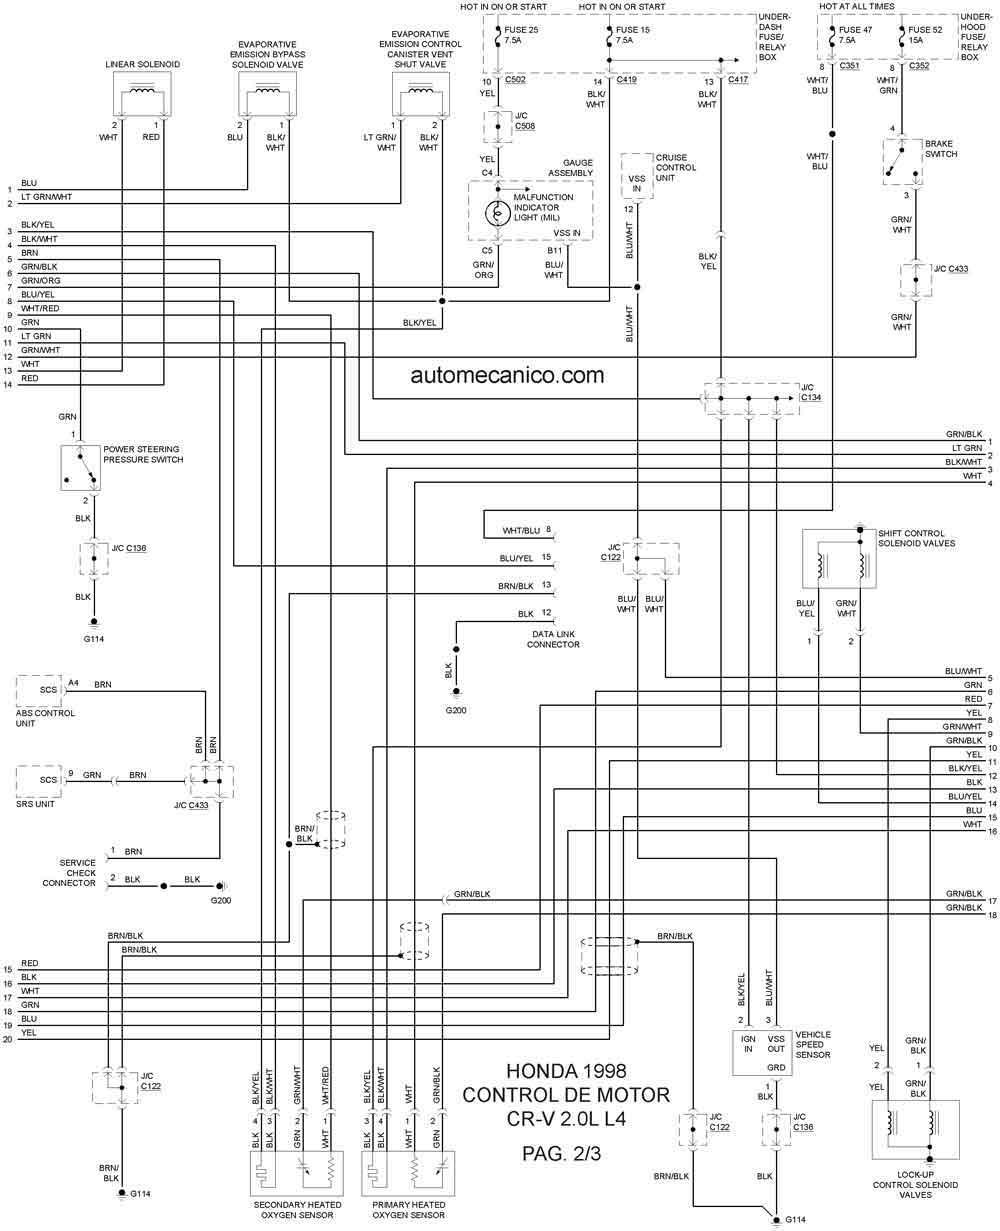 Honda 1998 Diagramas Esquemas Graphics Vehiculos Motores